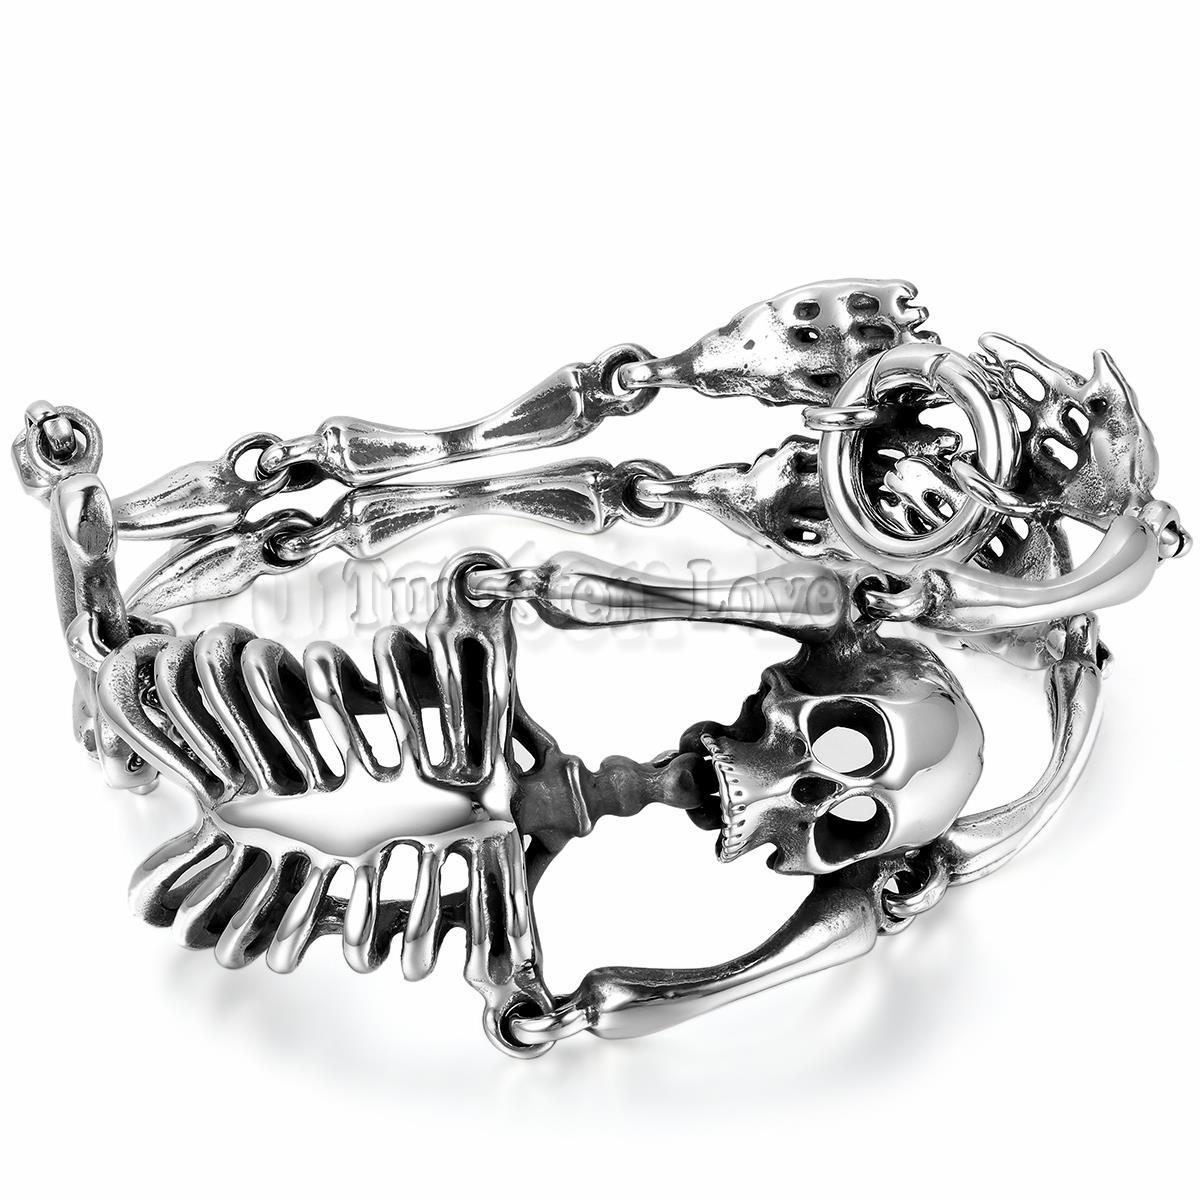 8 6 inch Men s Stainless Steel Bracelet Link Wrist Silver Black Skull Skeleton Vintage Jewelry